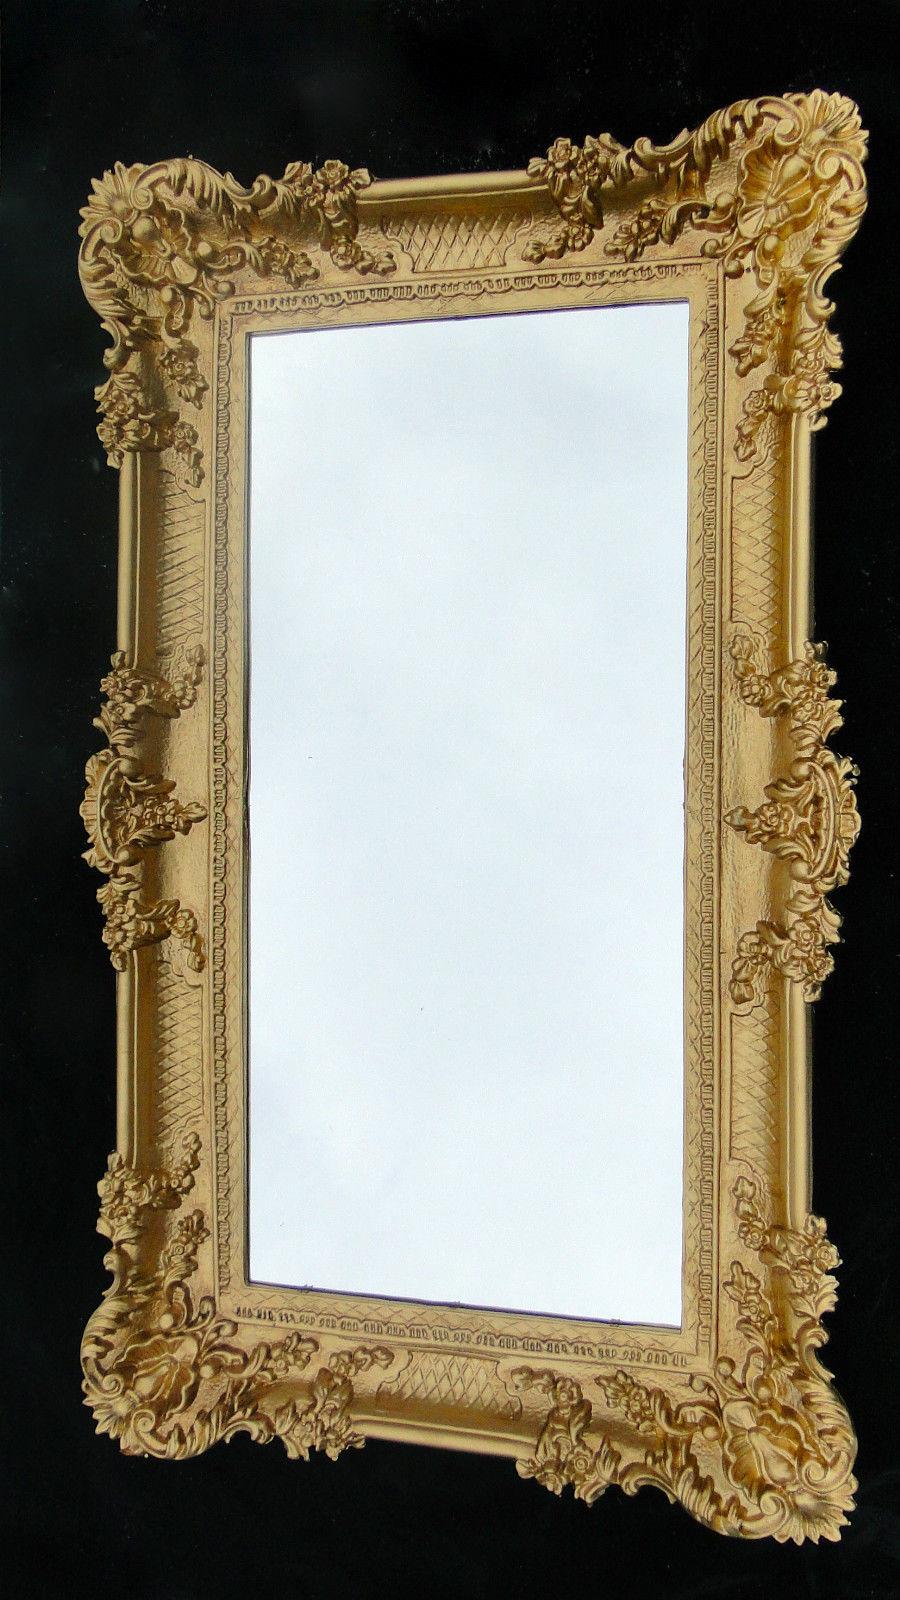 wandspiegel barock gold spiegel antik 96x57 badspiegel. Black Bedroom Furniture Sets. Home Design Ideas